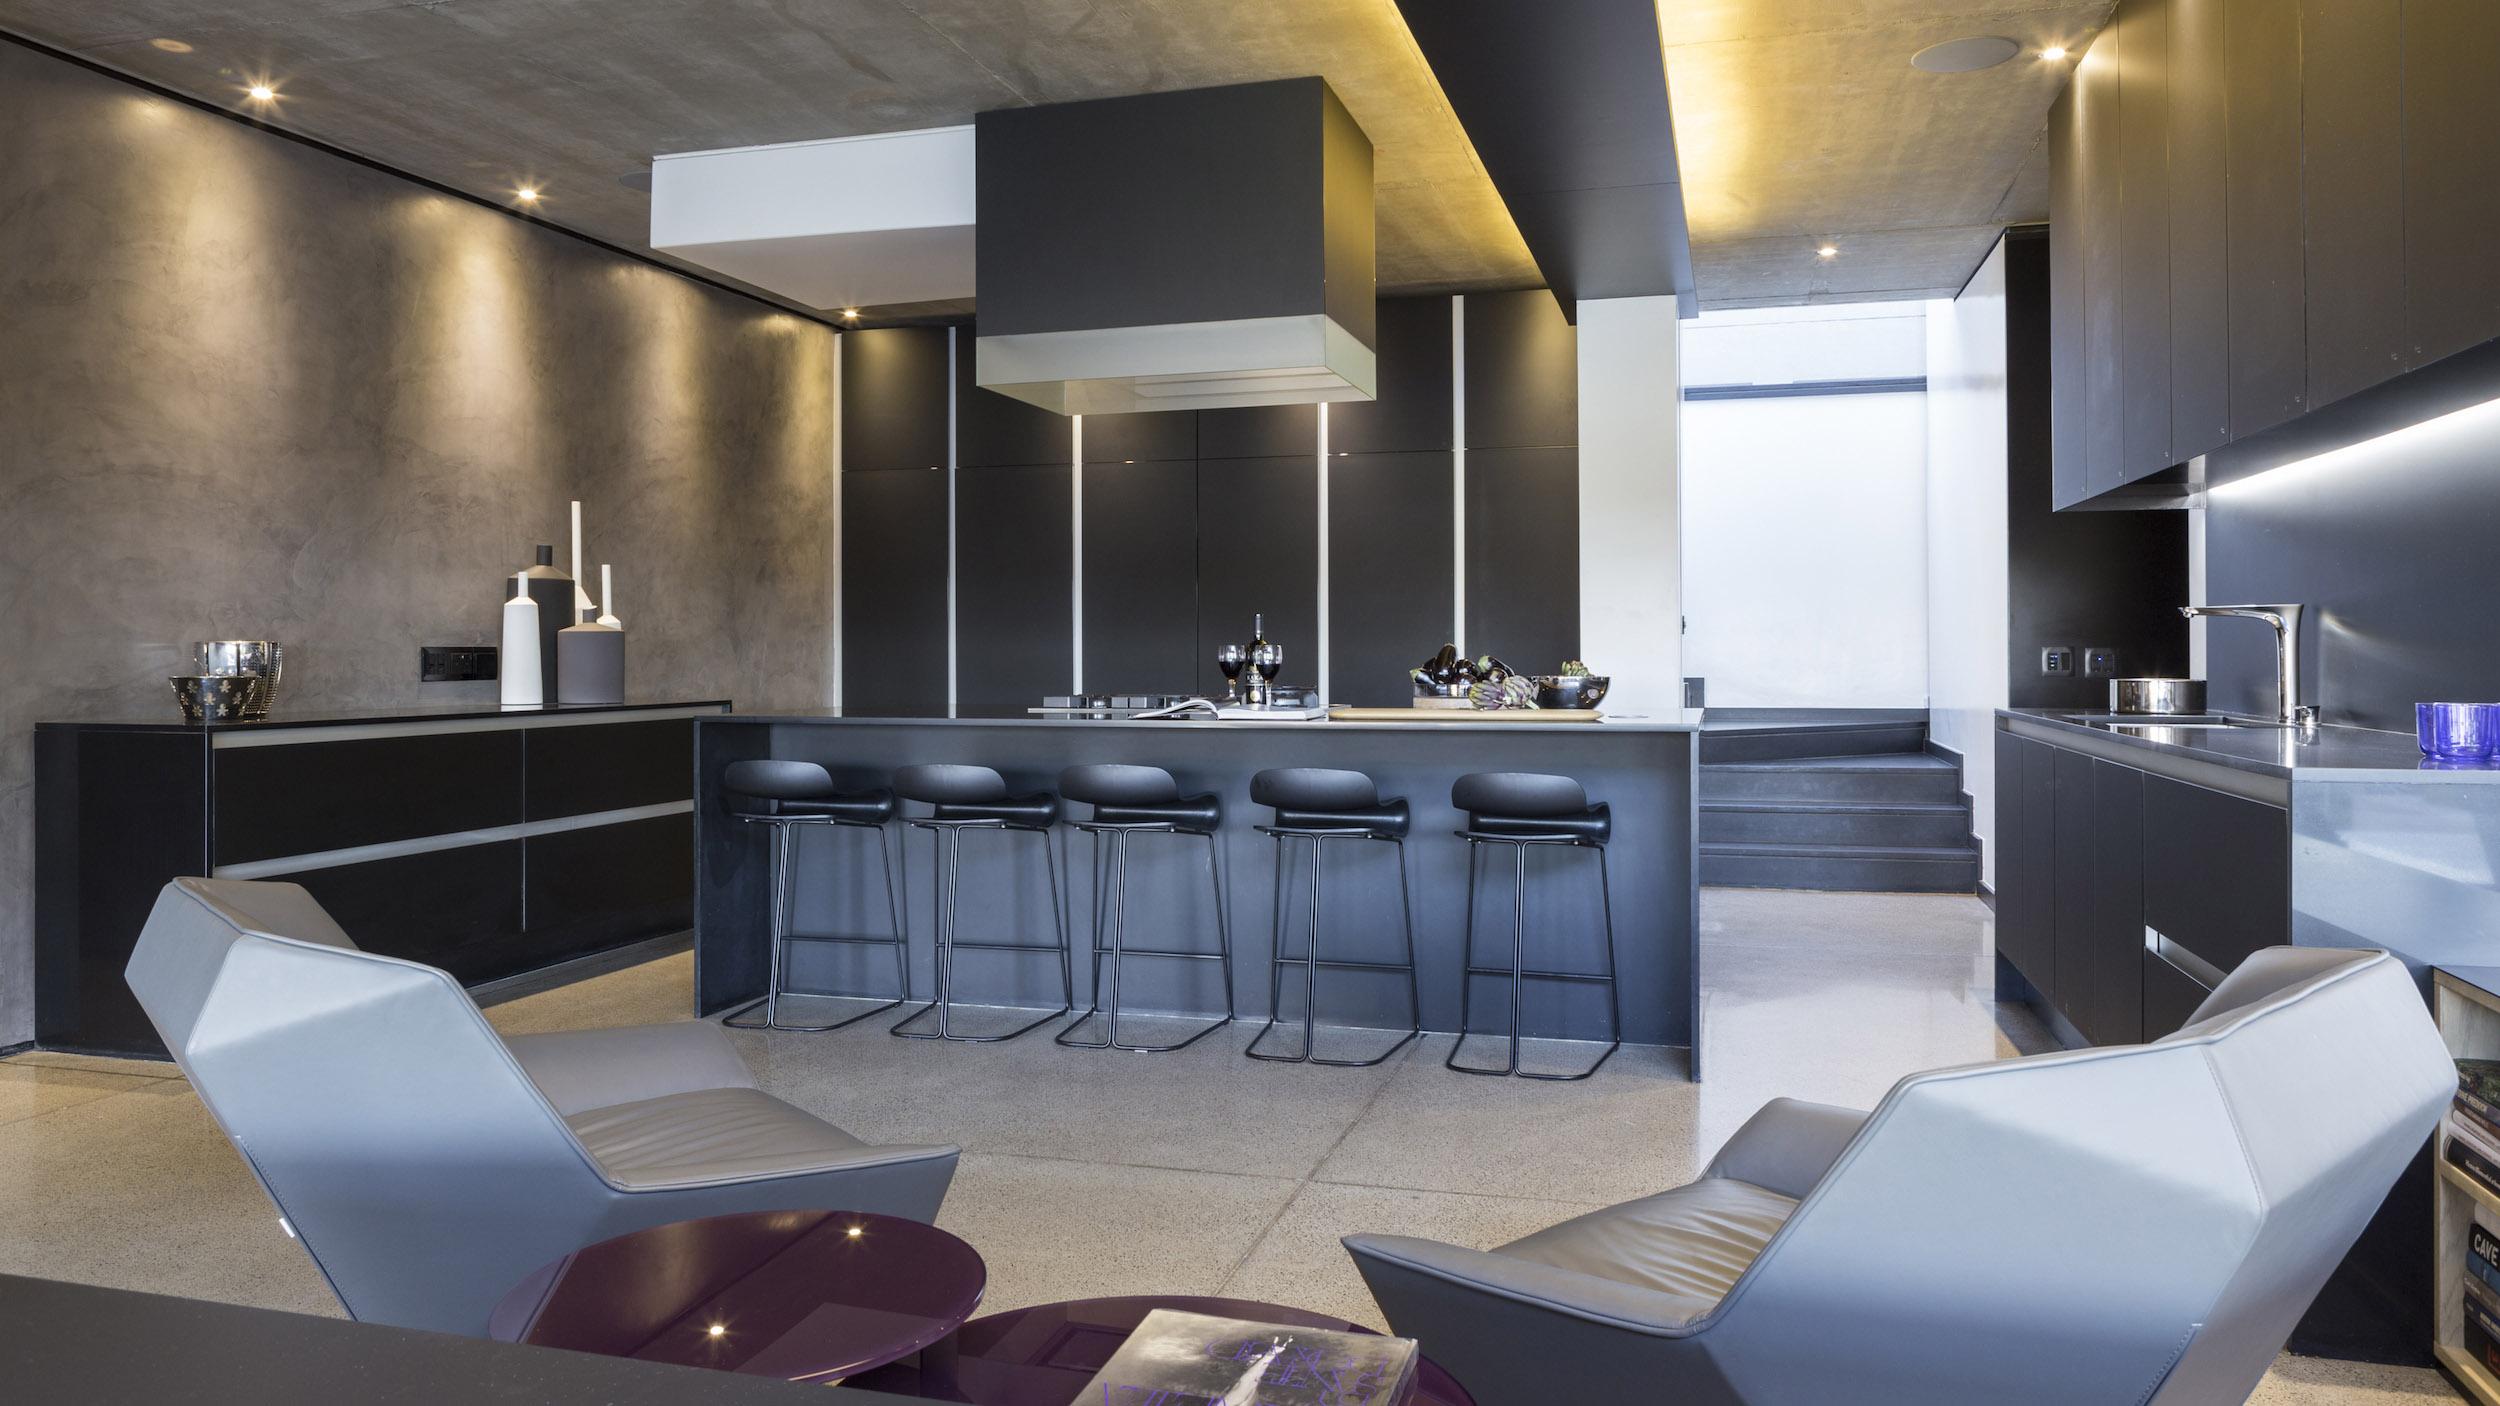 Kloof Road Masterpiece House in Johannesburg by Nico van der Meulen Architects-28